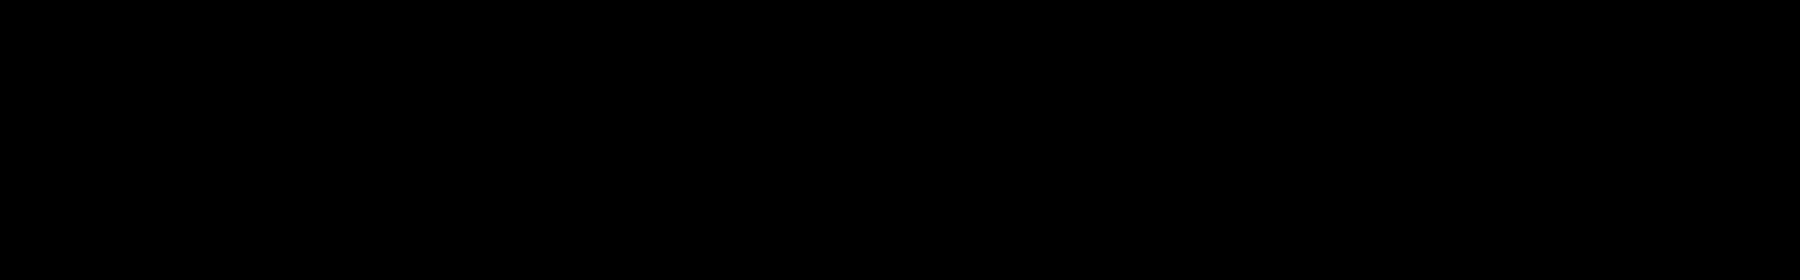 Oblivion [MIDI, WAV, FLP] audio waveform